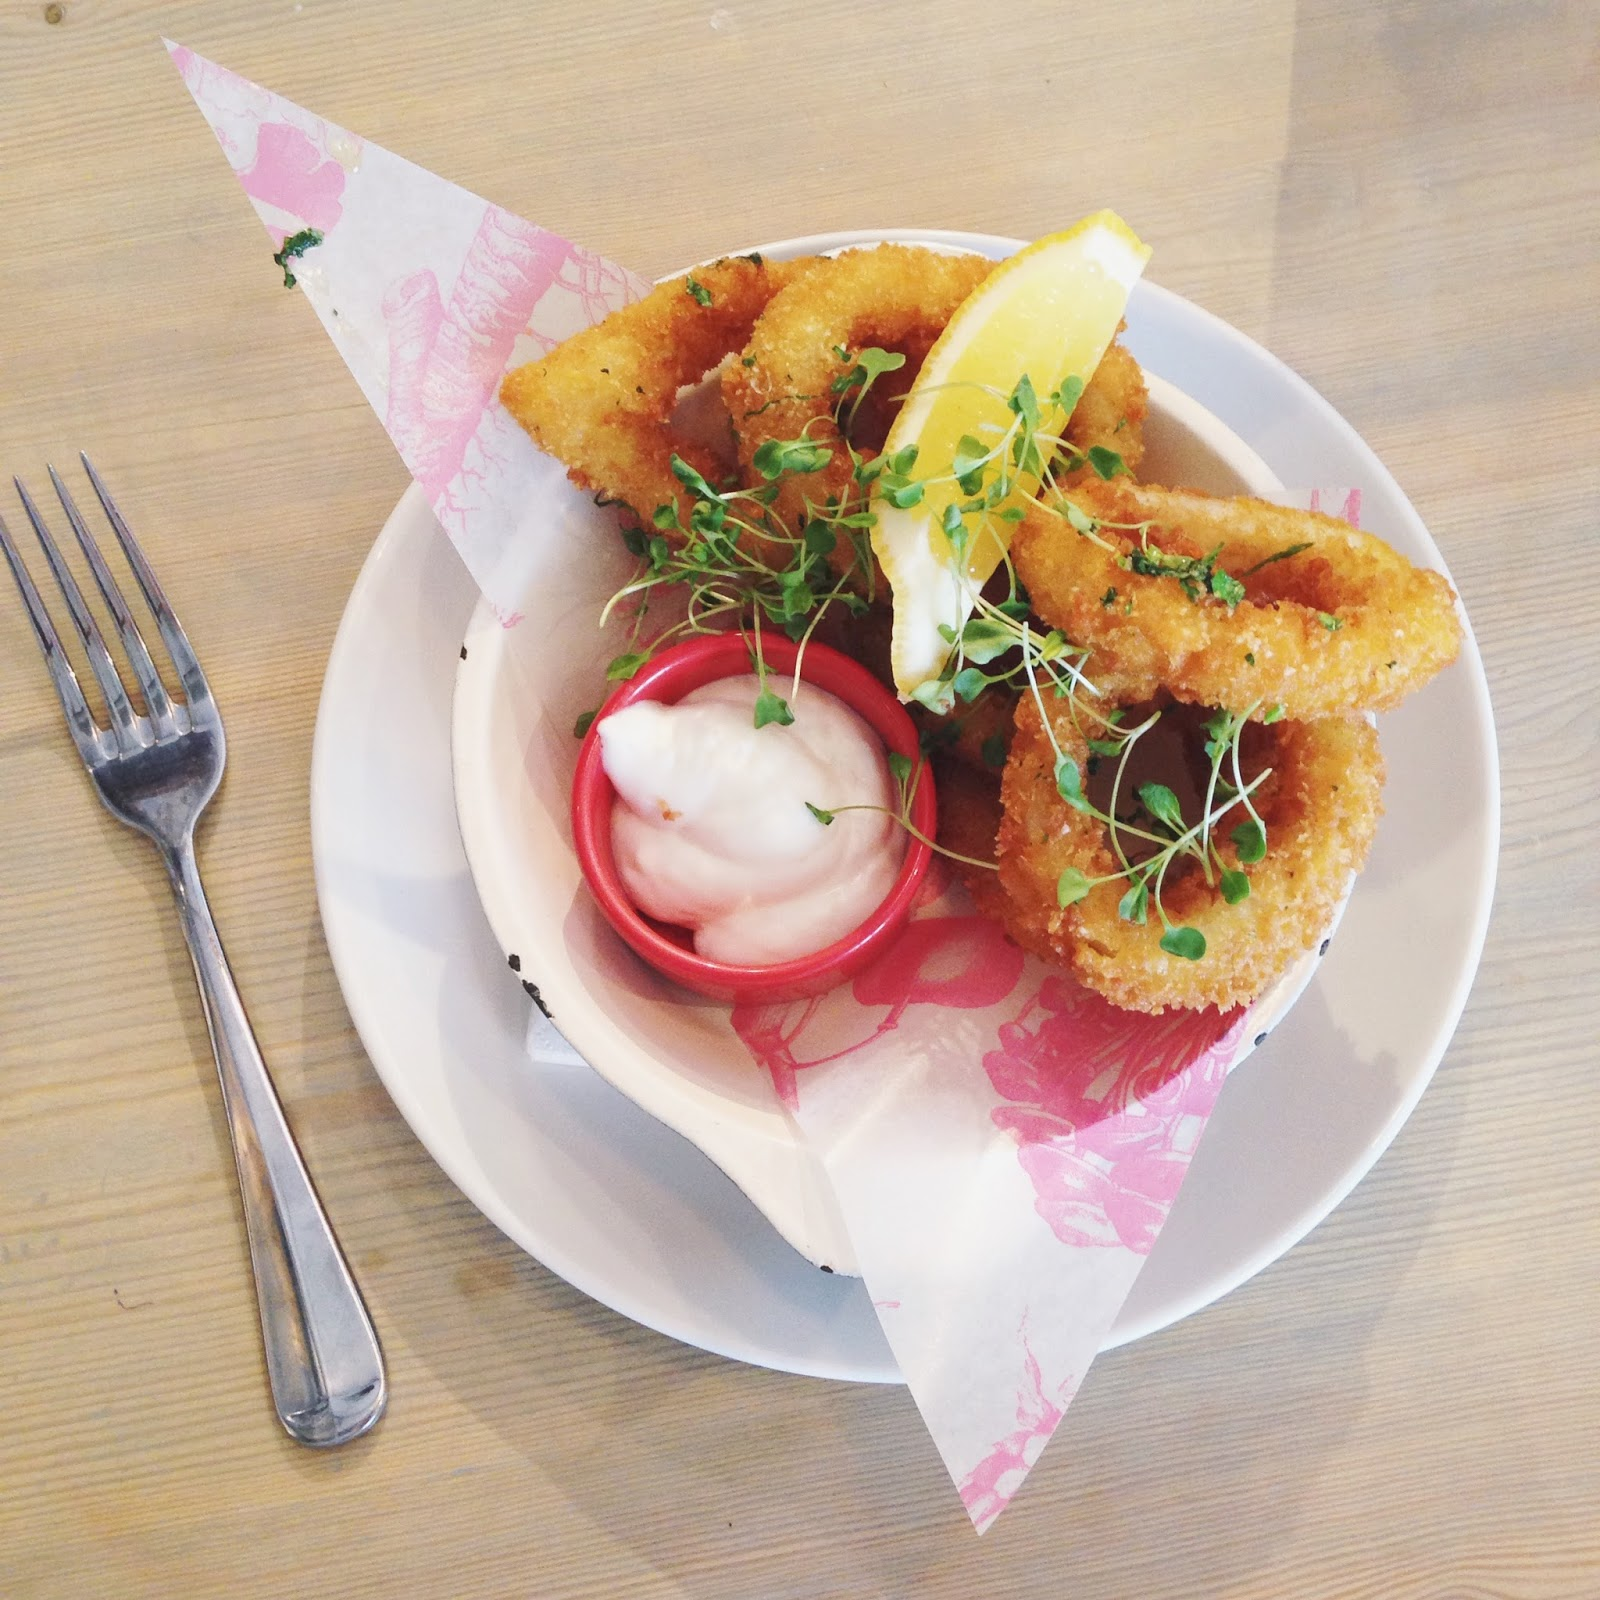 calamari in breadcrumbs